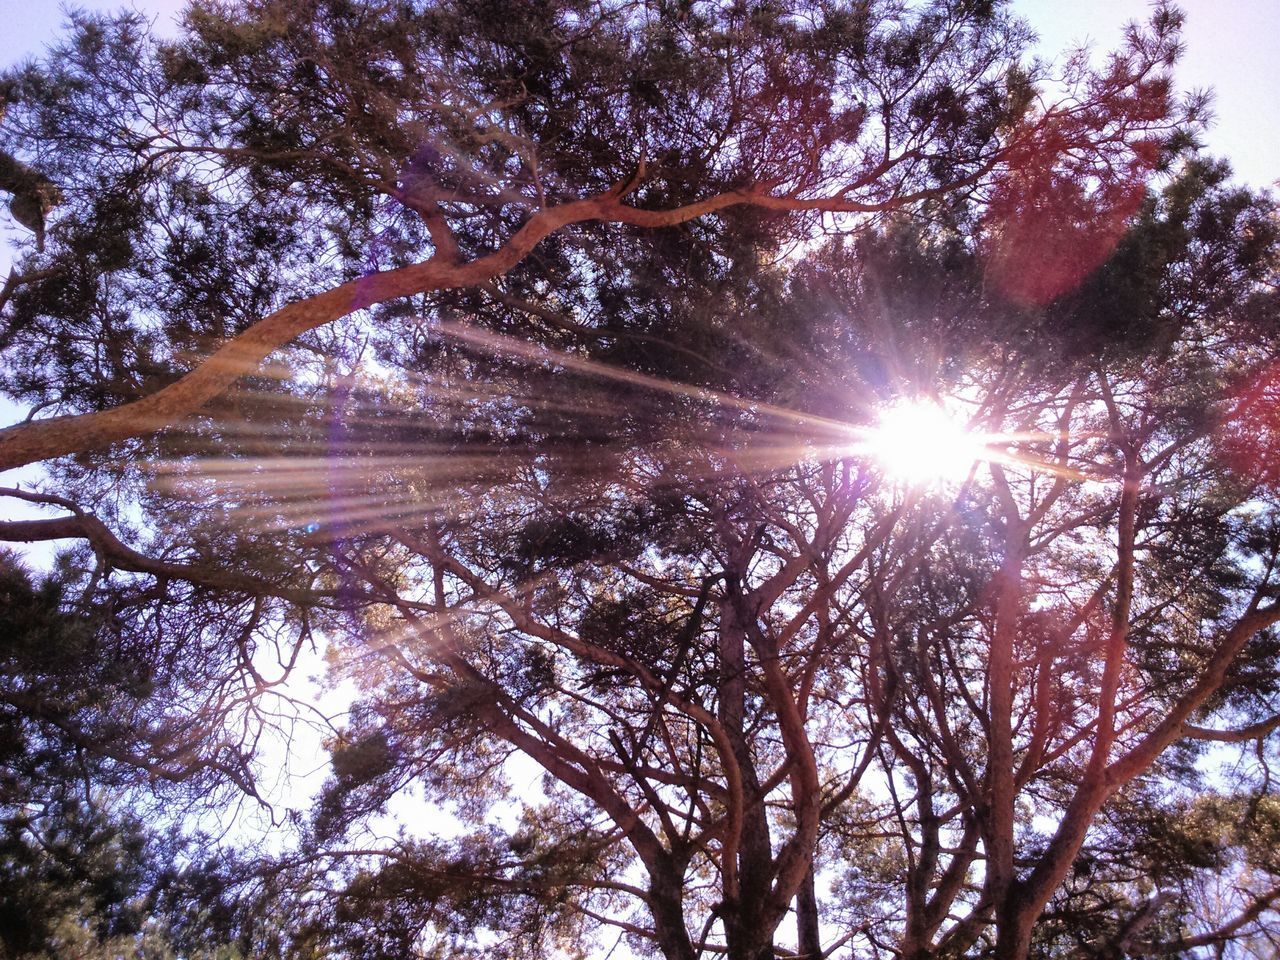 Sun Rays Sun Rays Penetrating Sun Rays Through Trees Sun Rays Behind The Tree Sun Rays Reflective Sun Glare